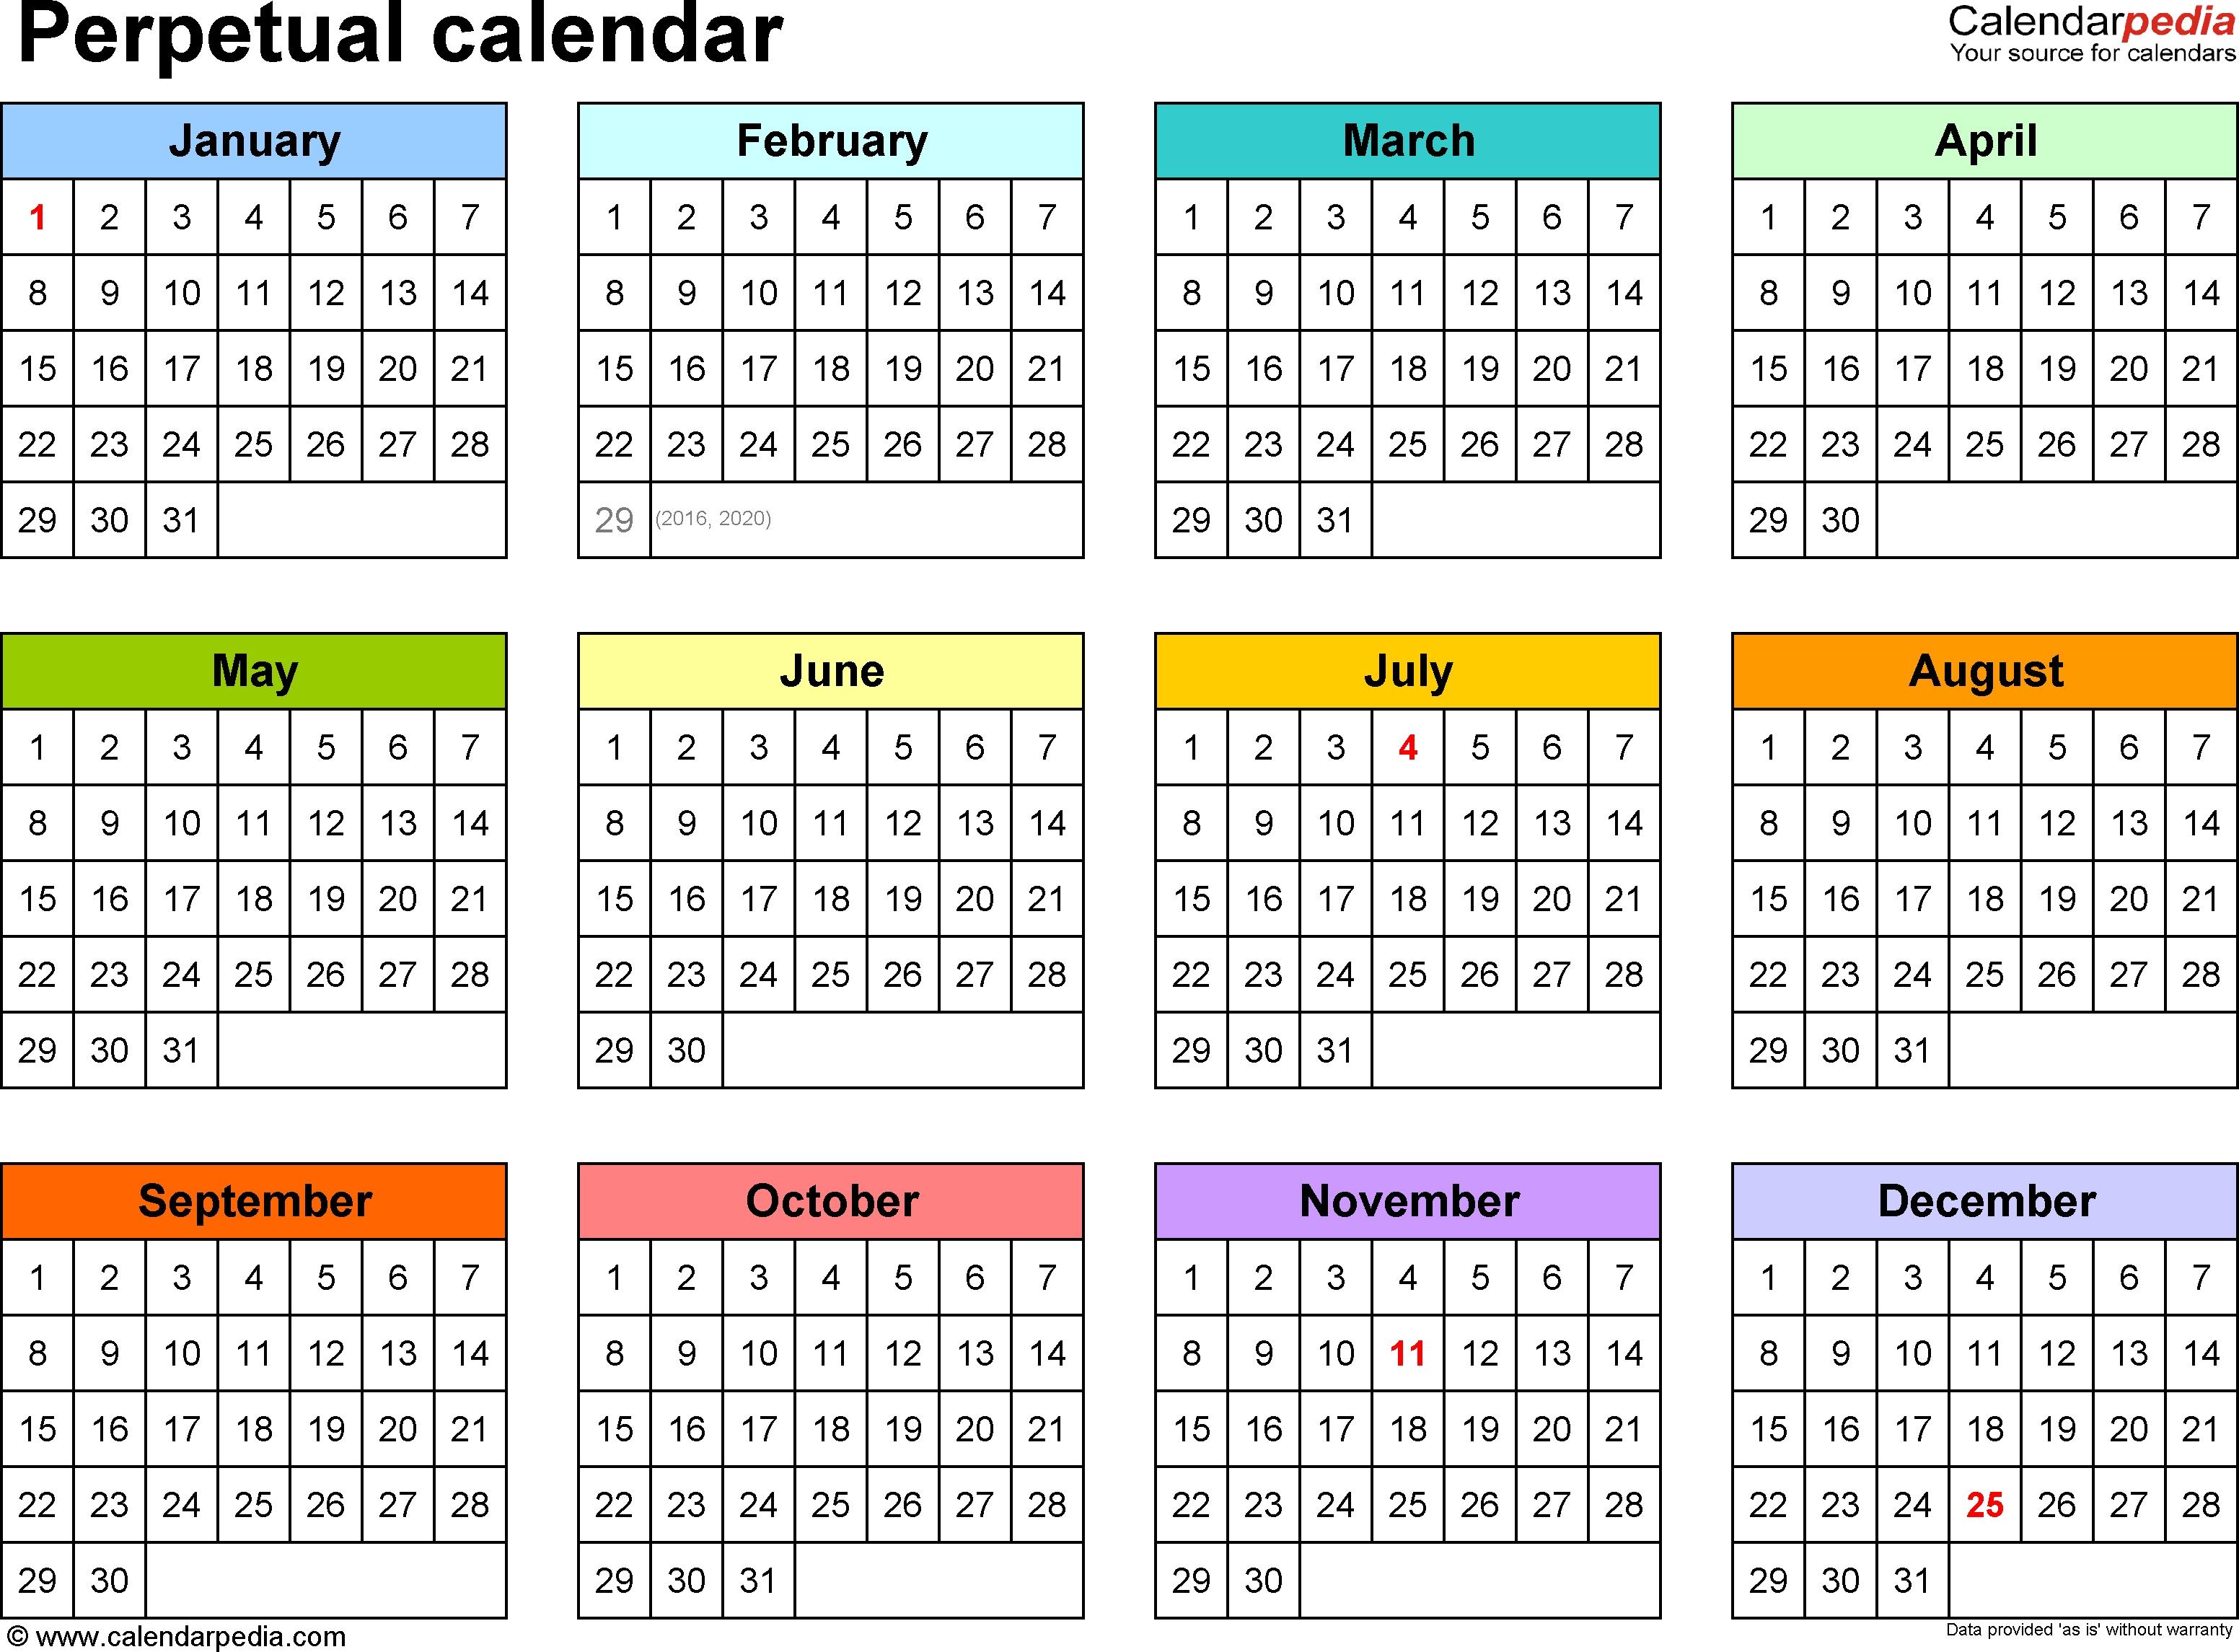 Perpetual Calendars - 7 Free Printable Word Templates  Depo Calendar 2020 Pdf